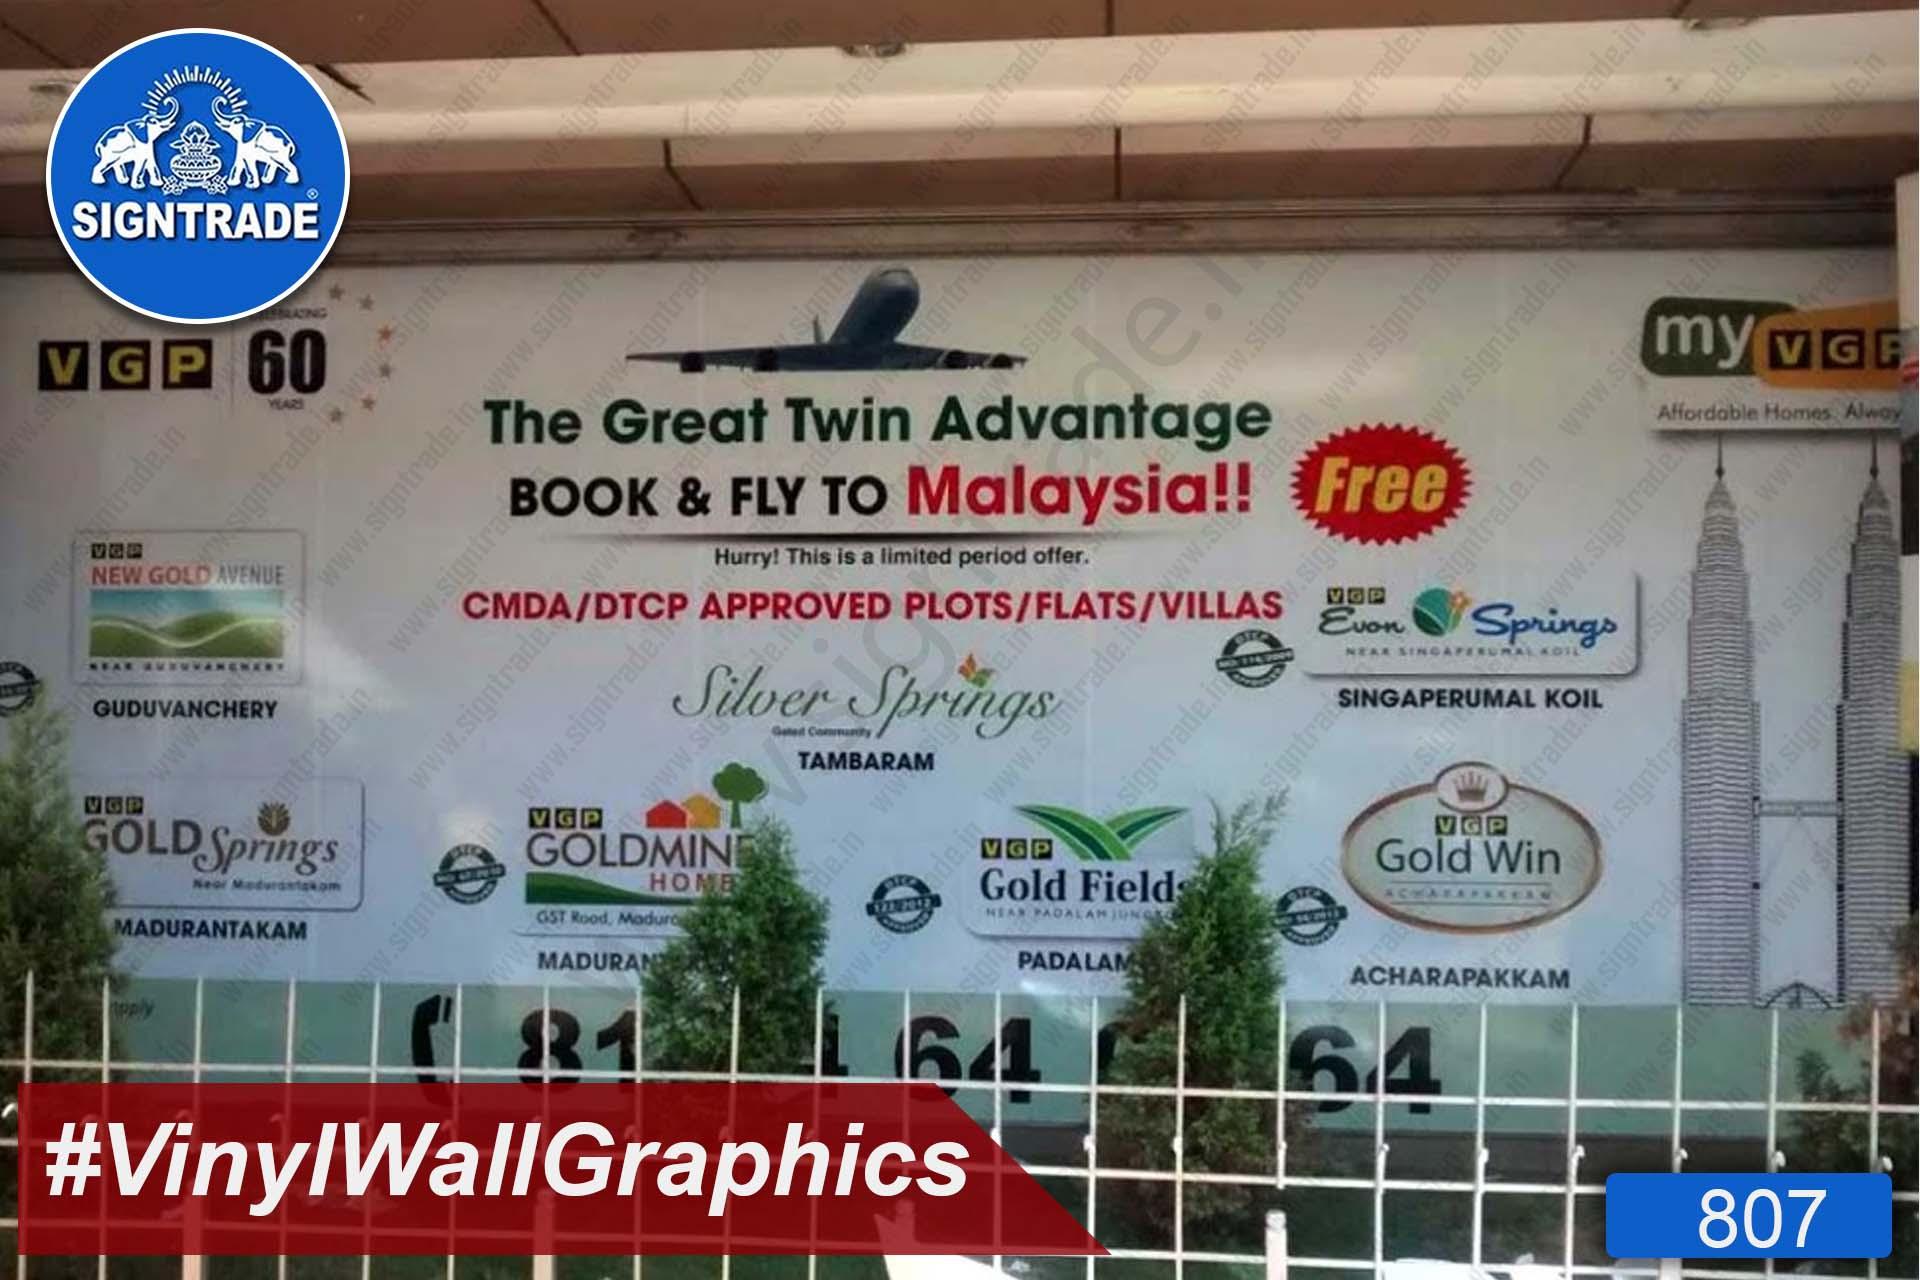 Wall Graphics - VGP Silver Springs